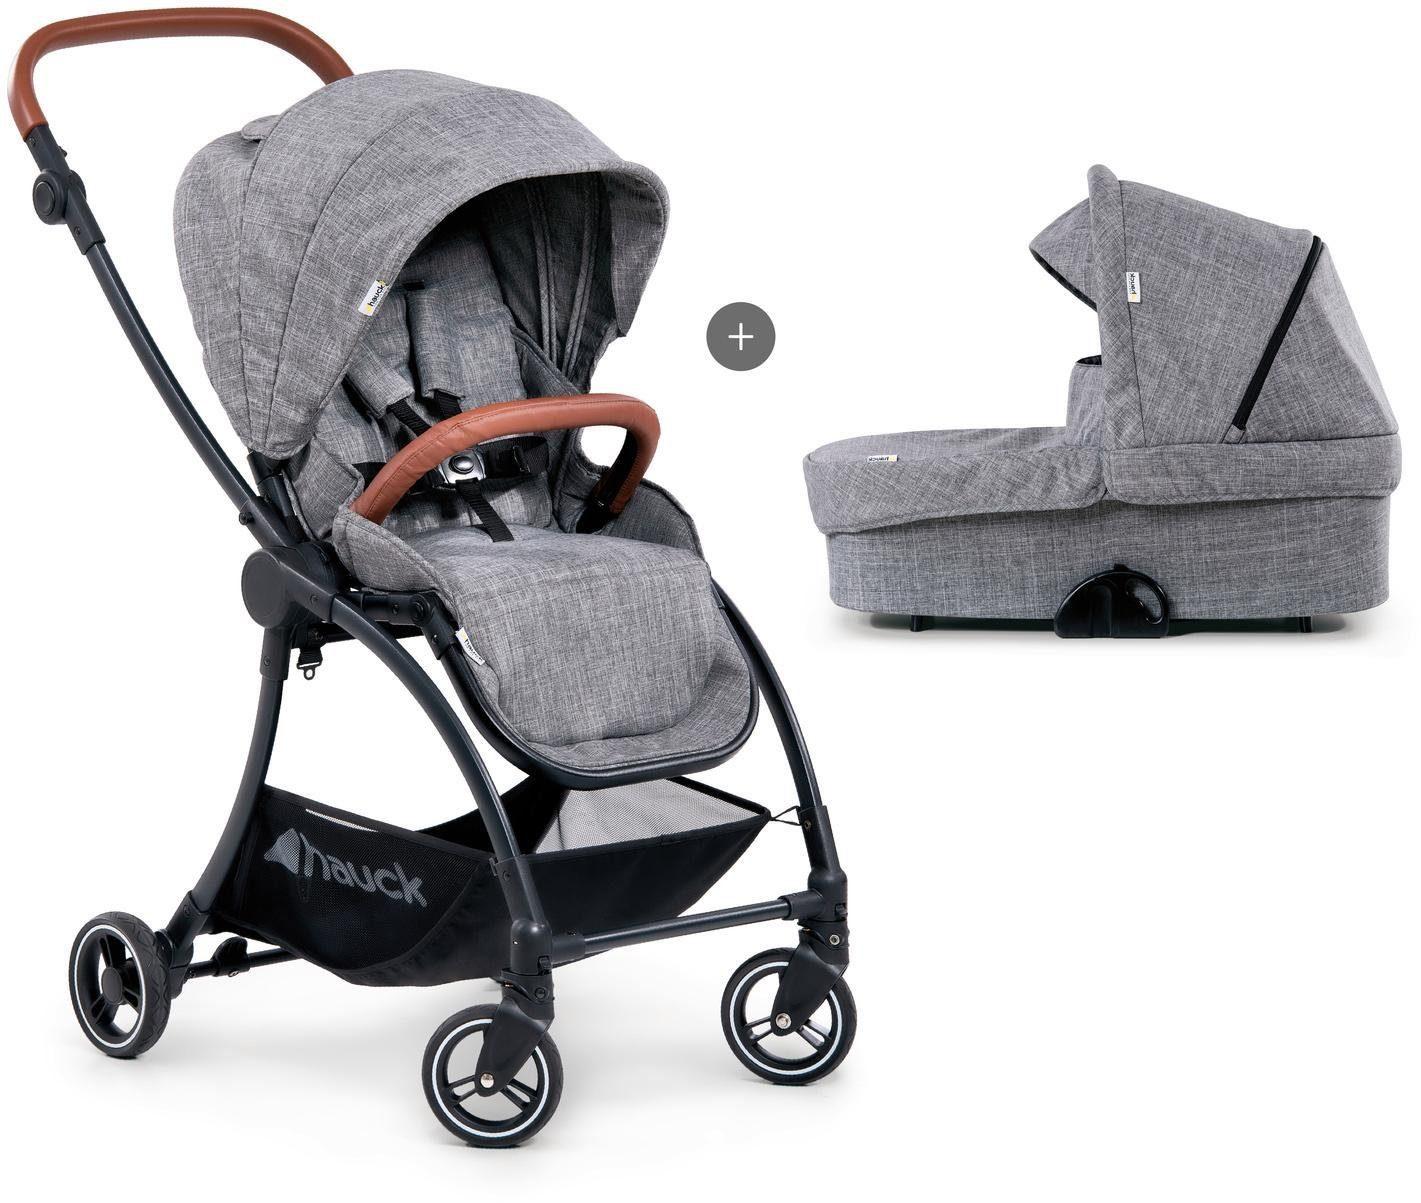 "Hauck Kombi-Kinderwagen ""Eagle 4S Duoset melange grey"" Kindermode/Ausstattung/Kinderwagen & Buggies/Kinderwagen/Kombikinderwagen"